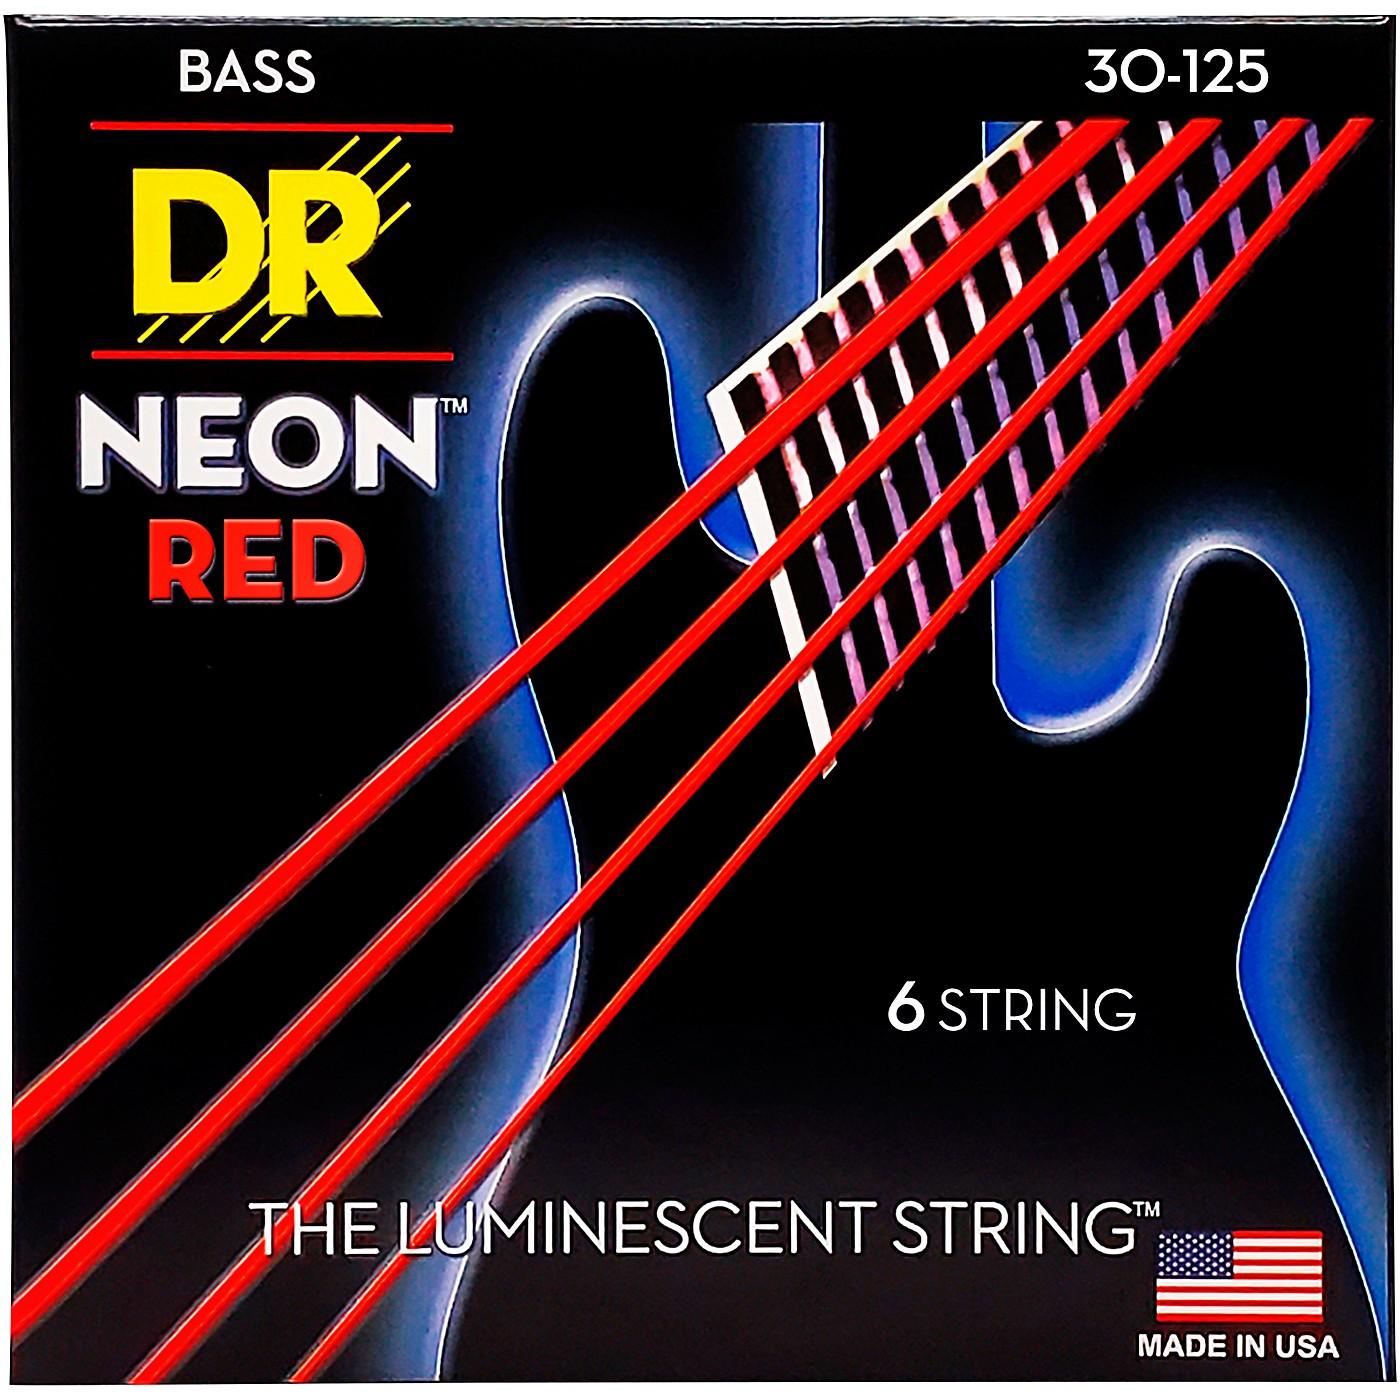 DR Strings Hi-Def NEON Red Coated Medium 6-String Bass Strings (30-125) thumbnail